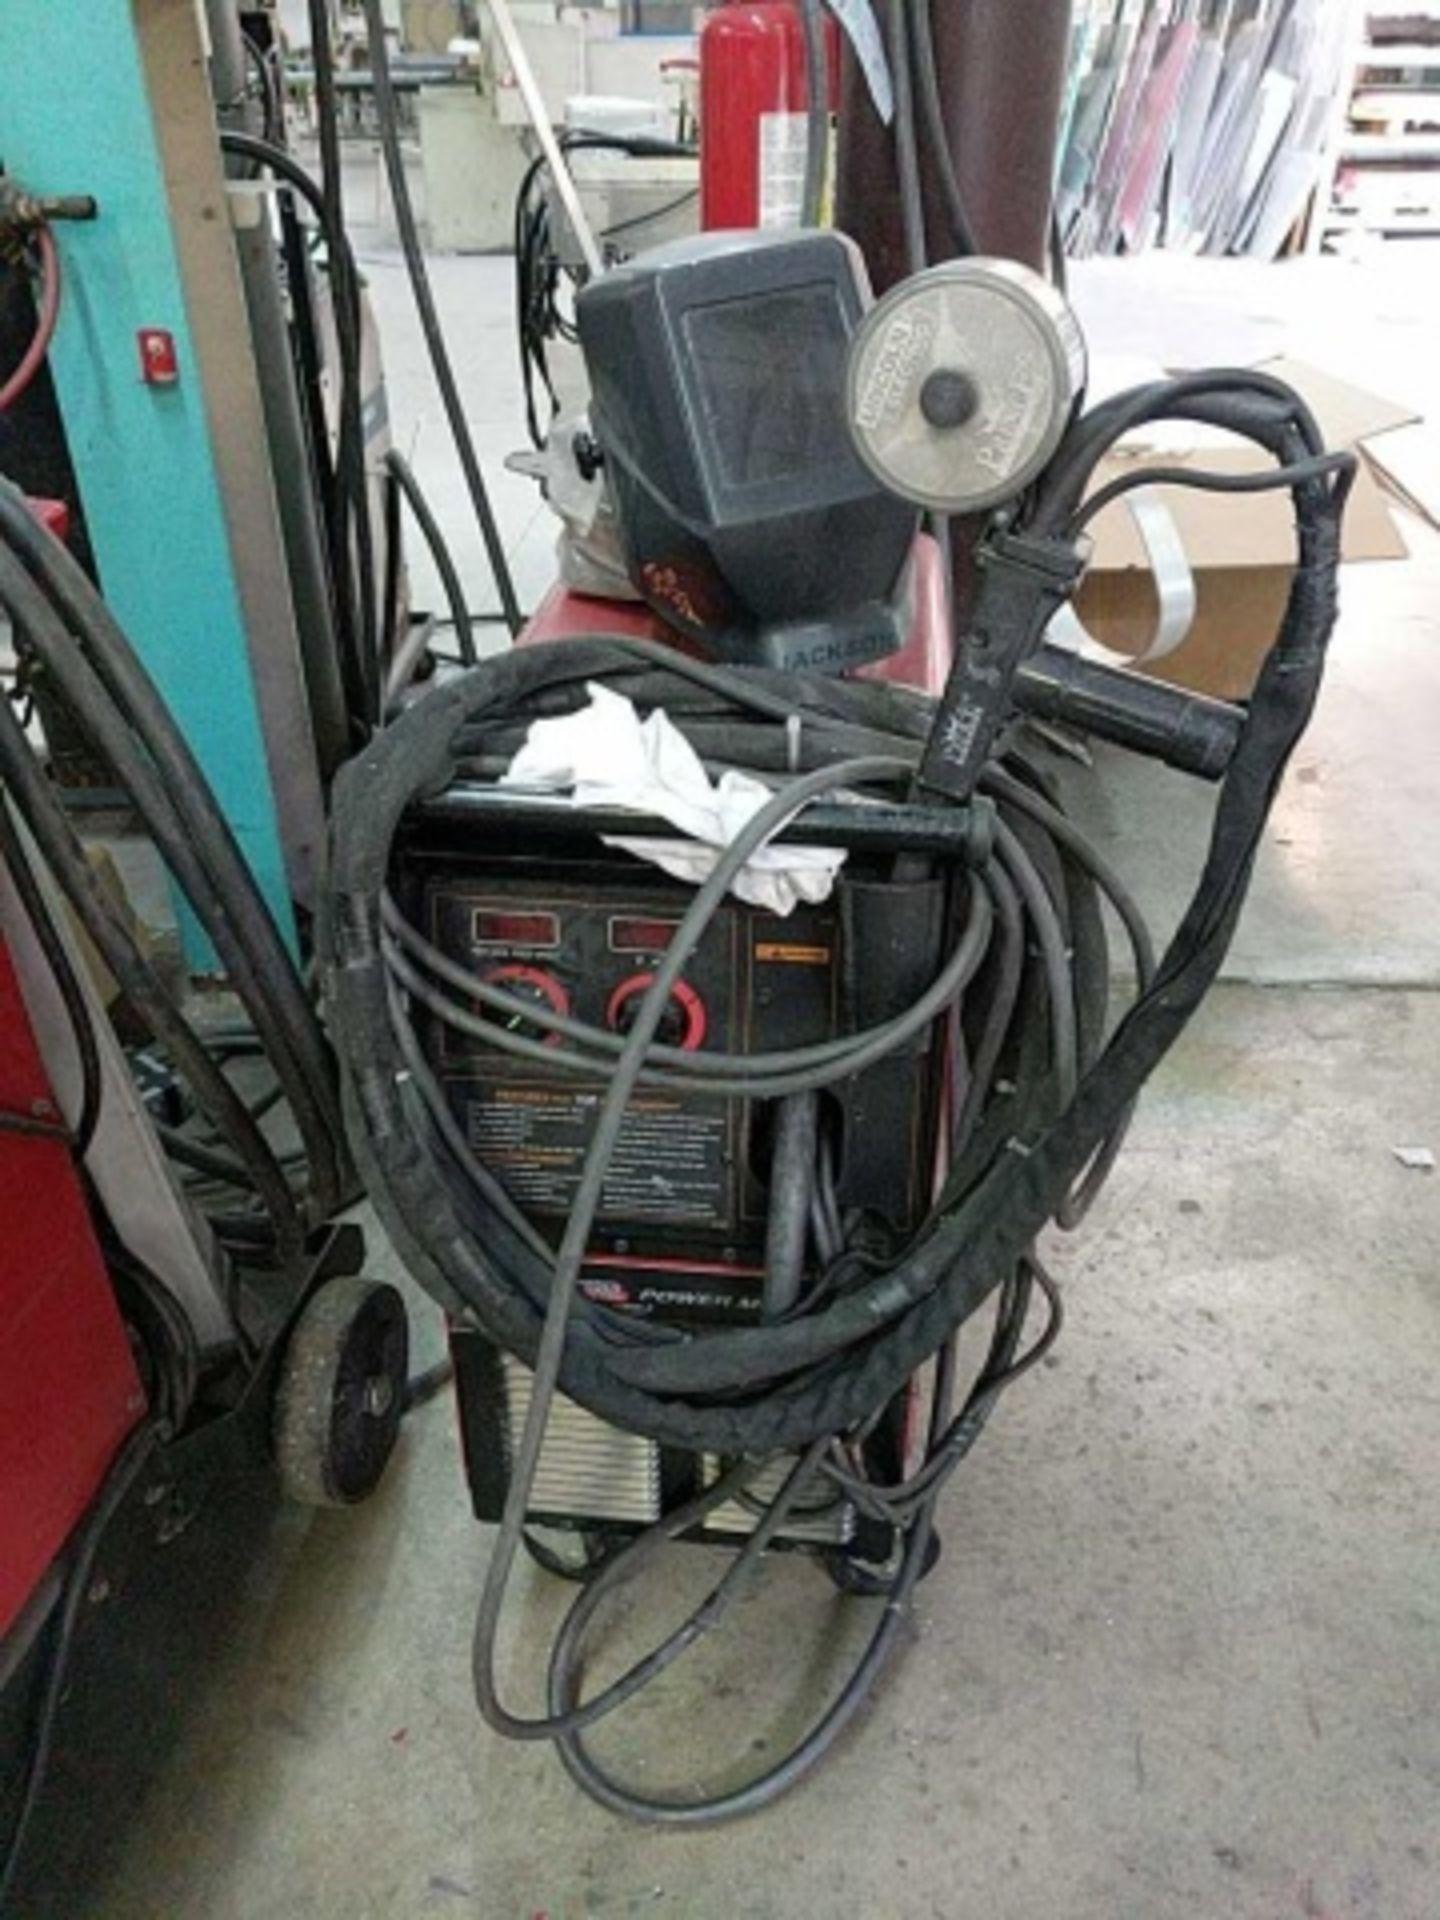 Lincoln Power Mig 255C Mig Welder